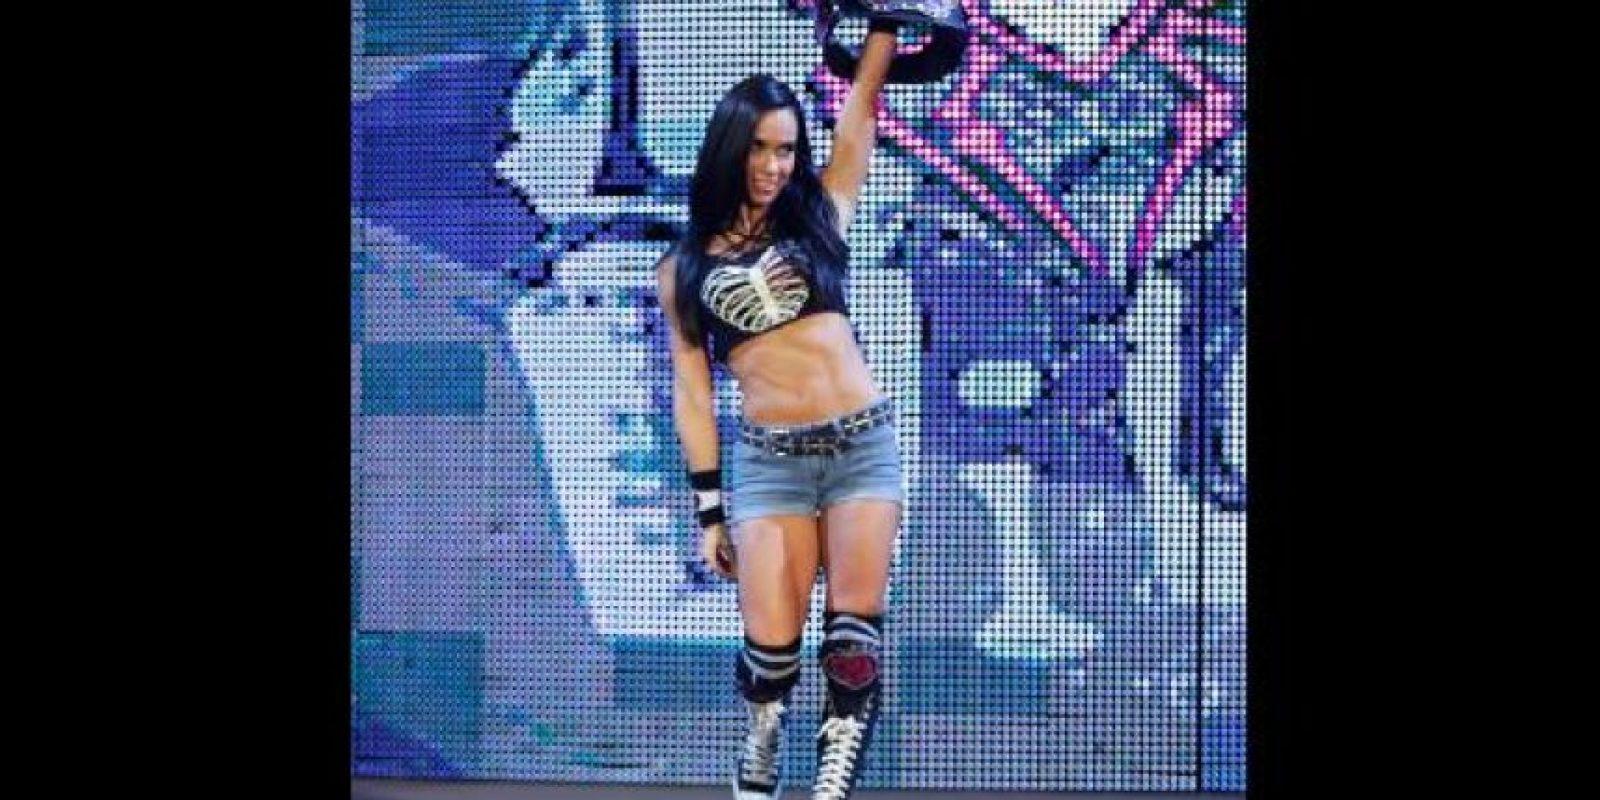 La campeona de las divas se llama April Jeanette Mendez-Brooks Foto:WWE